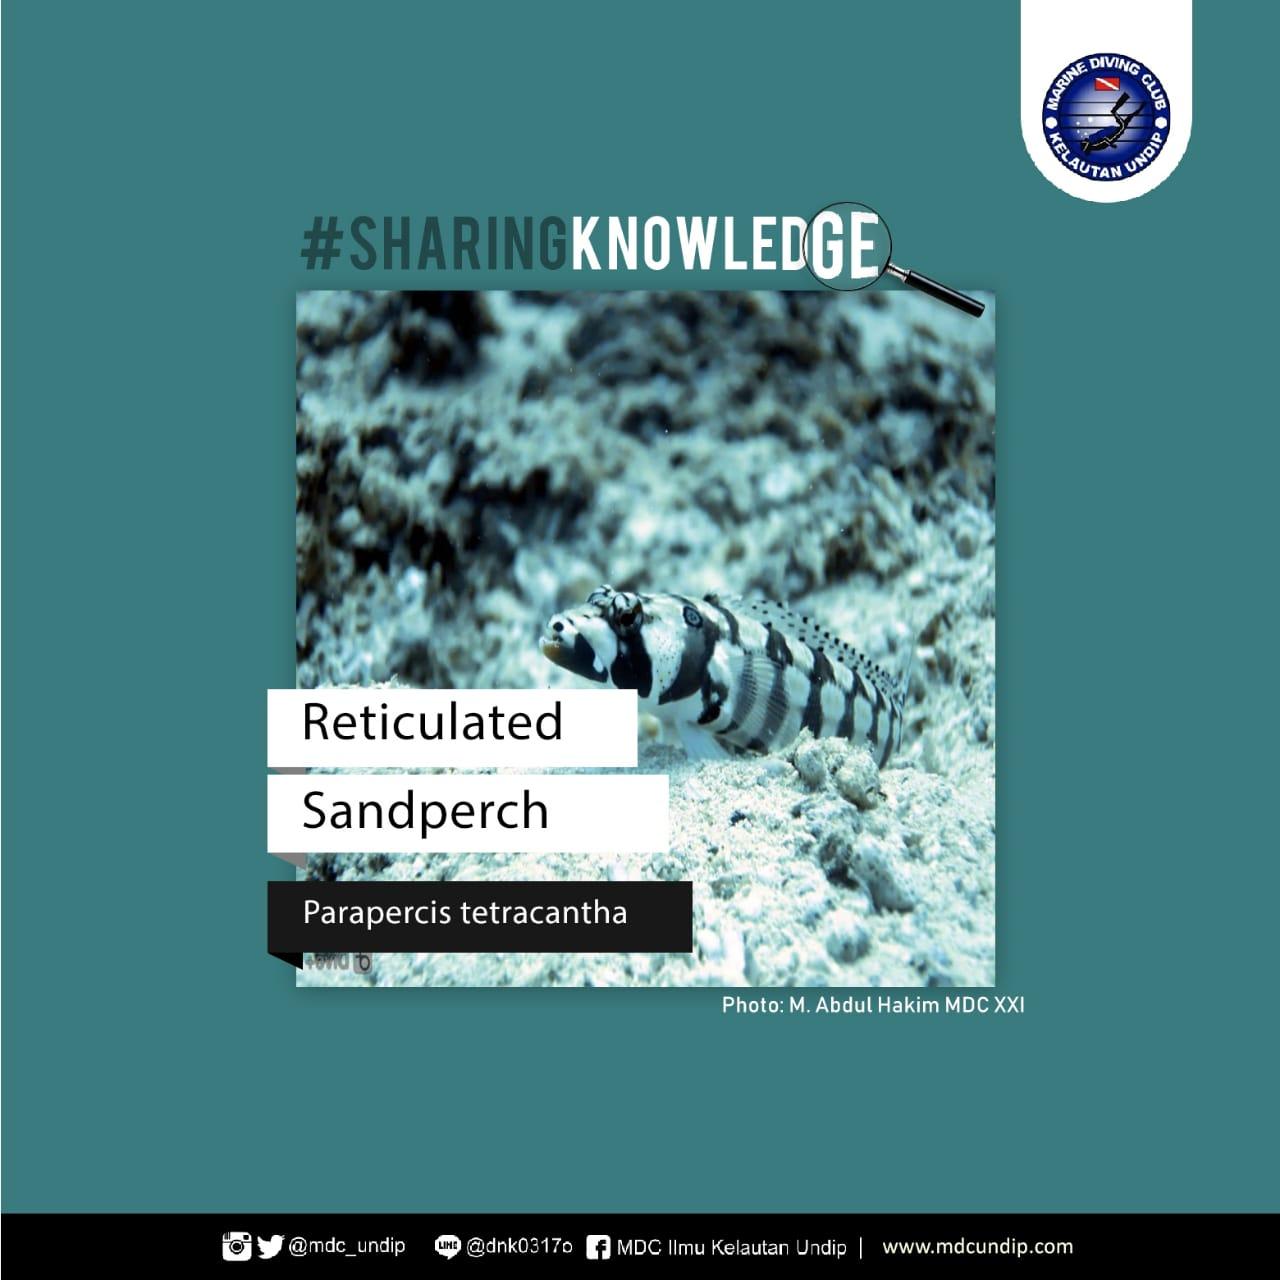 Sandperch: Parapercis tetracantha